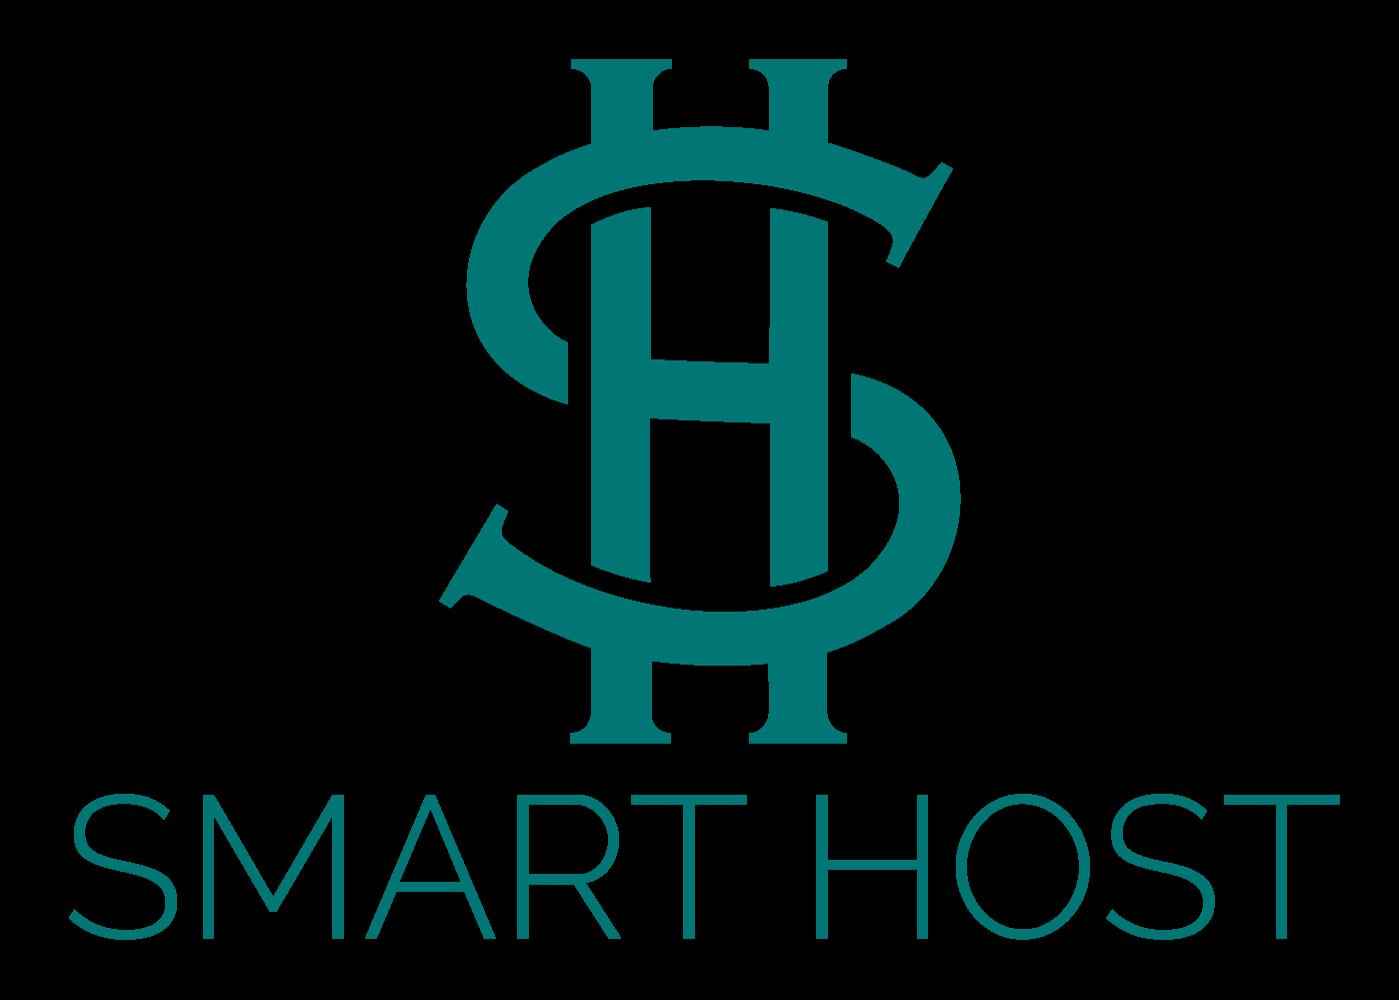 Smart Host